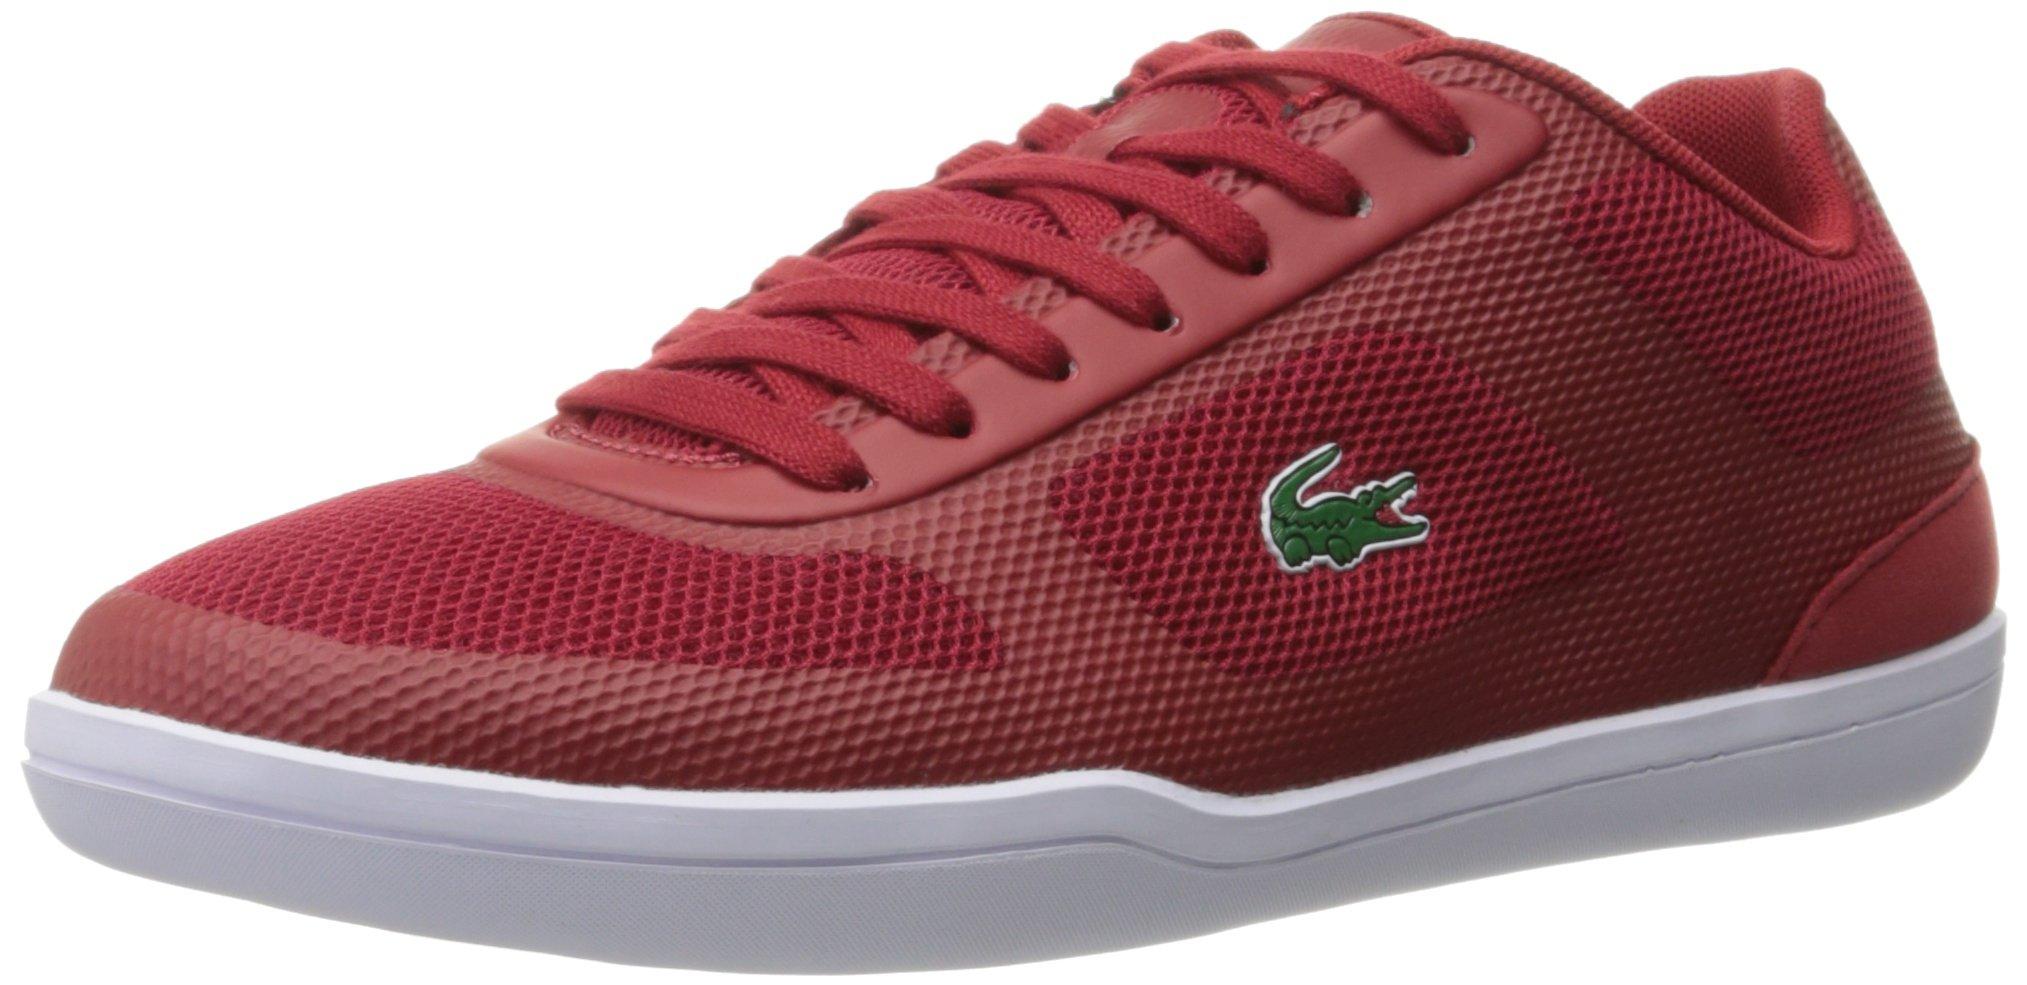 Lacoste Men S Court Minimal Sport   Spm Fashion Sneaker